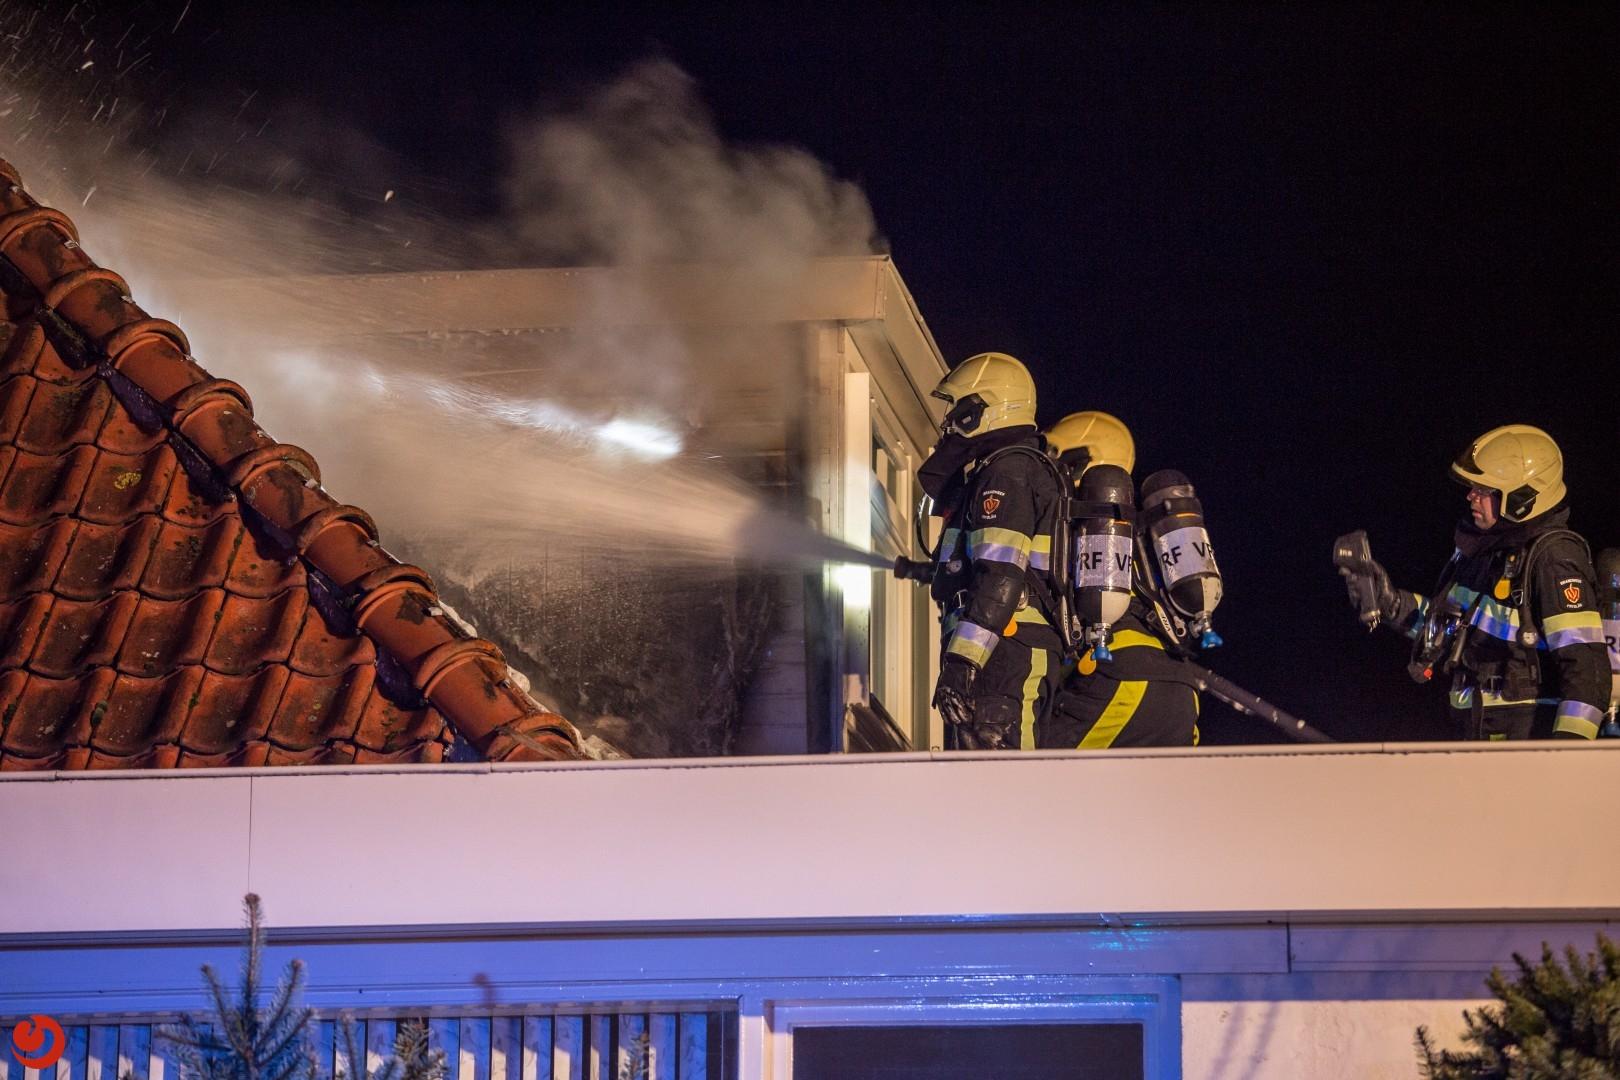 Rookontwikkeling bij woningbrand